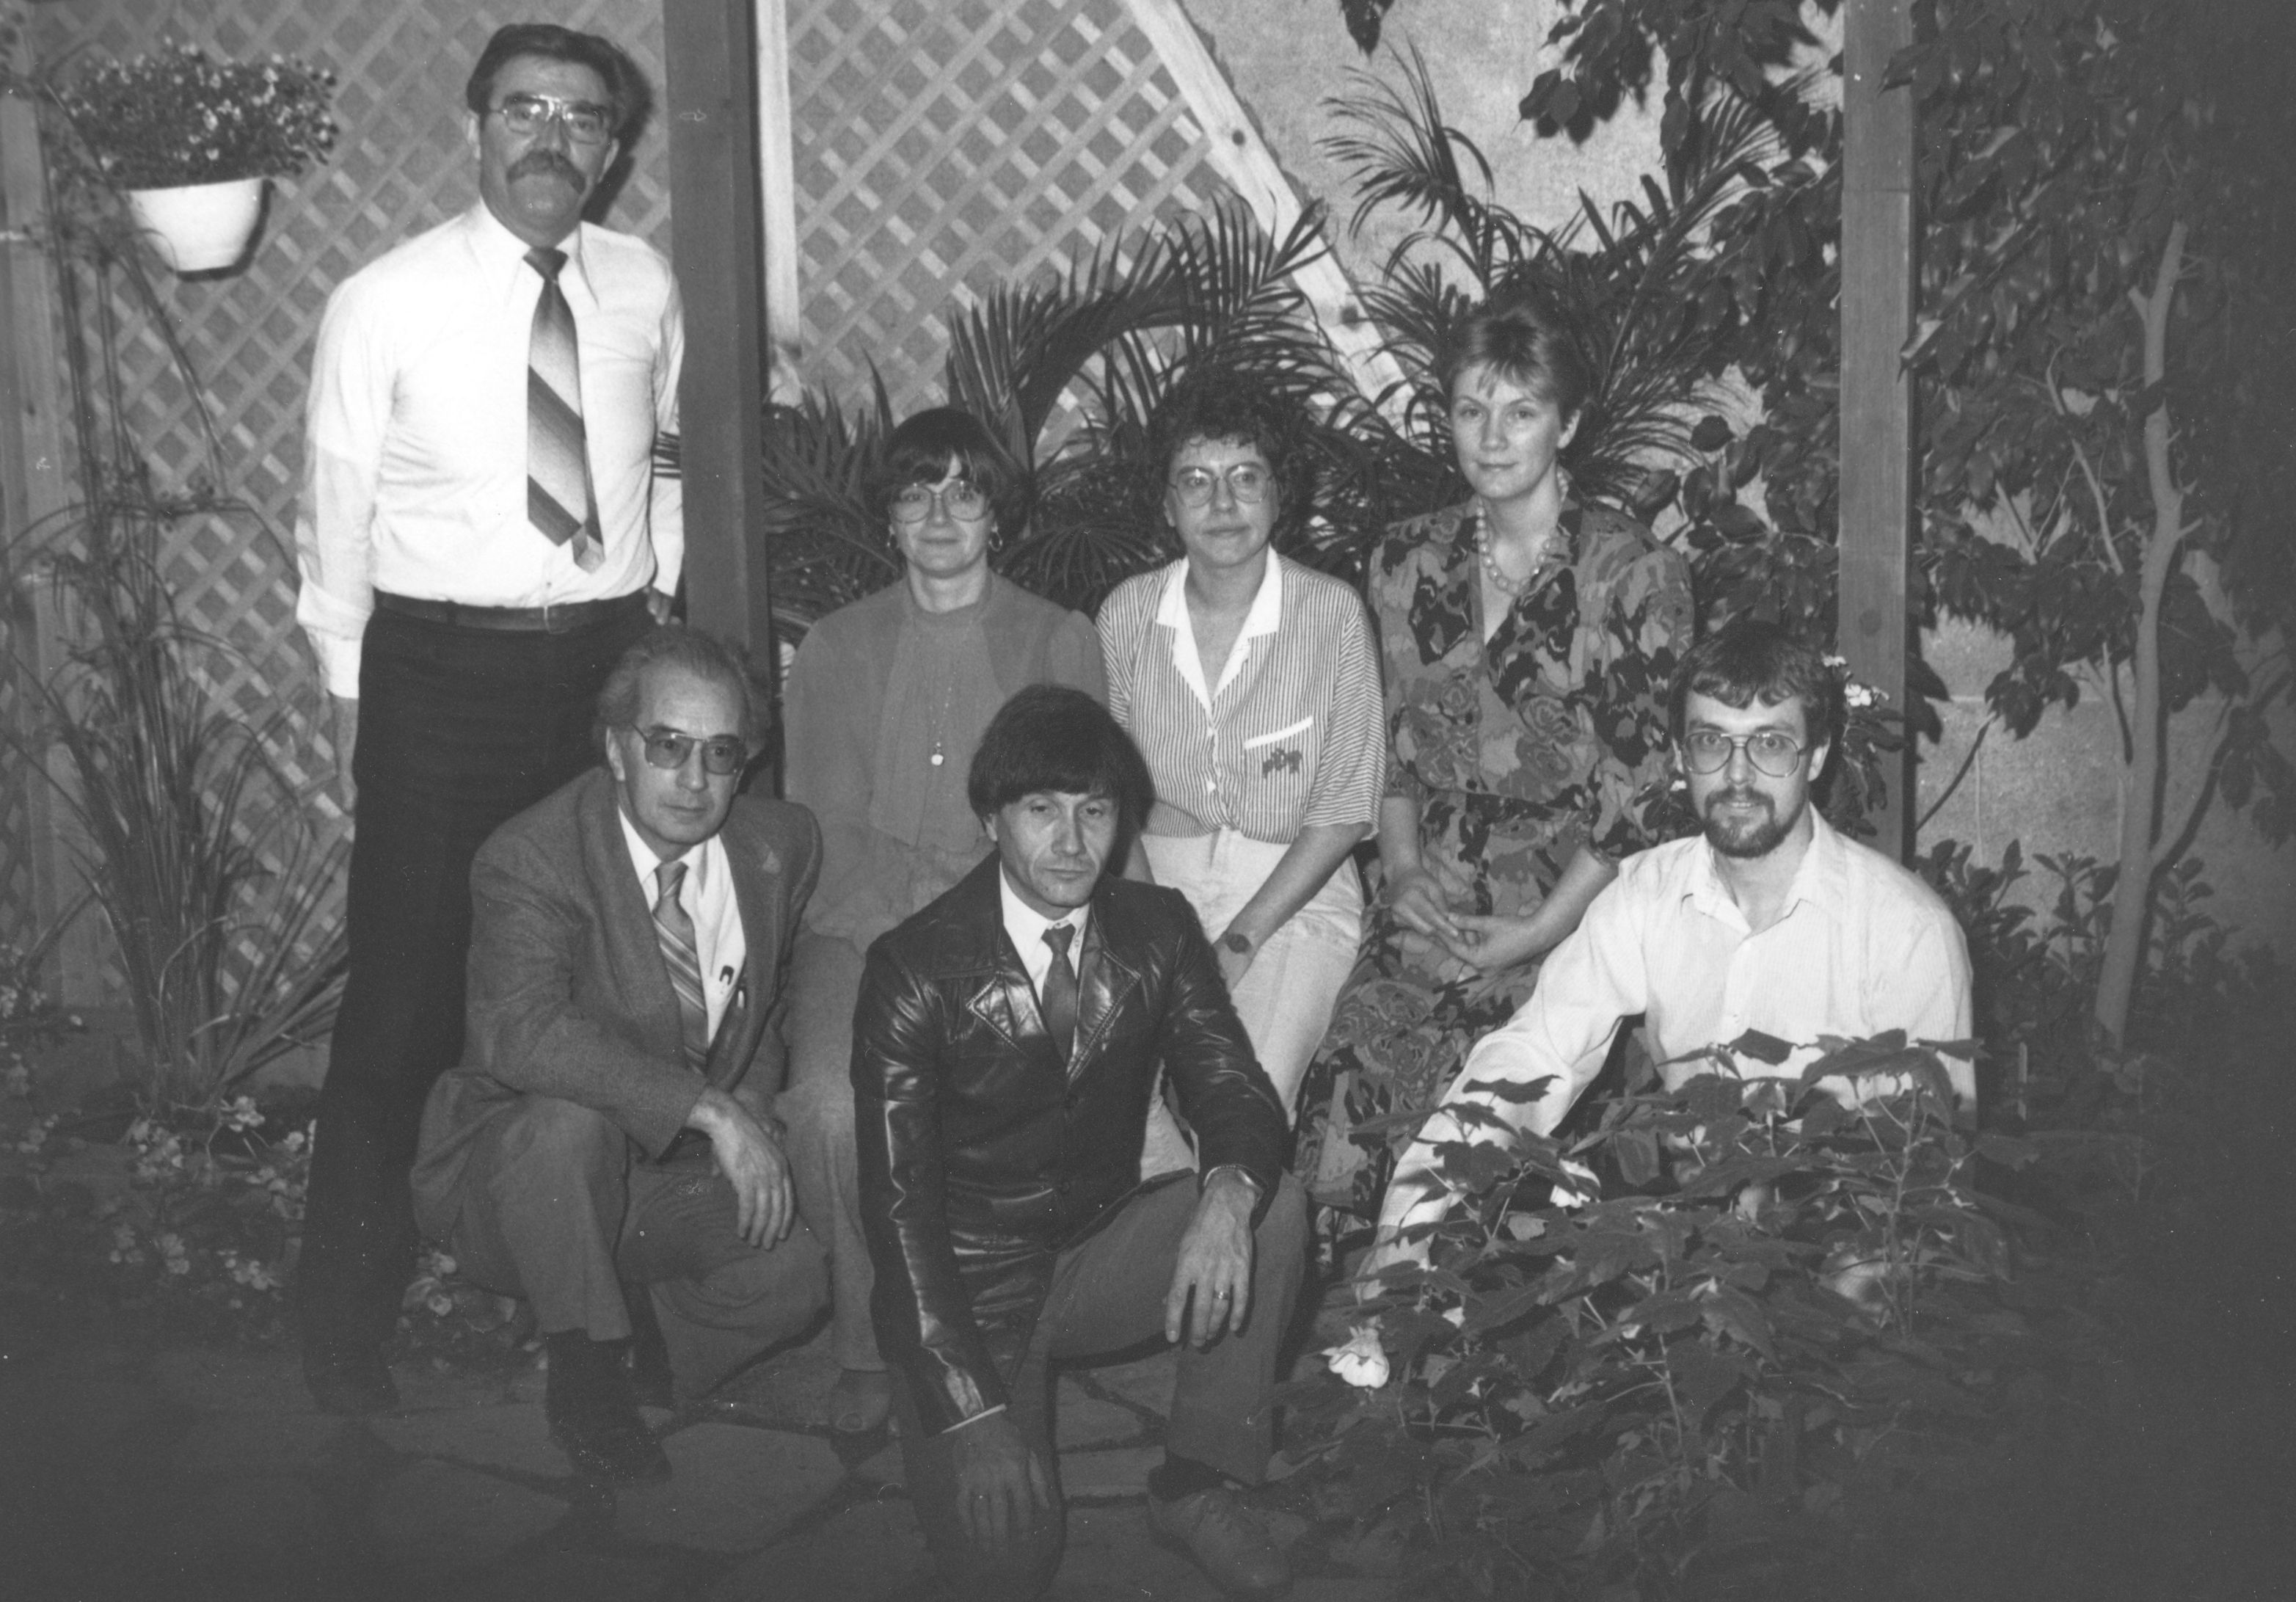 1987-Alimentaire-Roger Belmon-Jean-Pierre Hebert-Claude Champagne-Bernard Daboval-Carole Vignola-